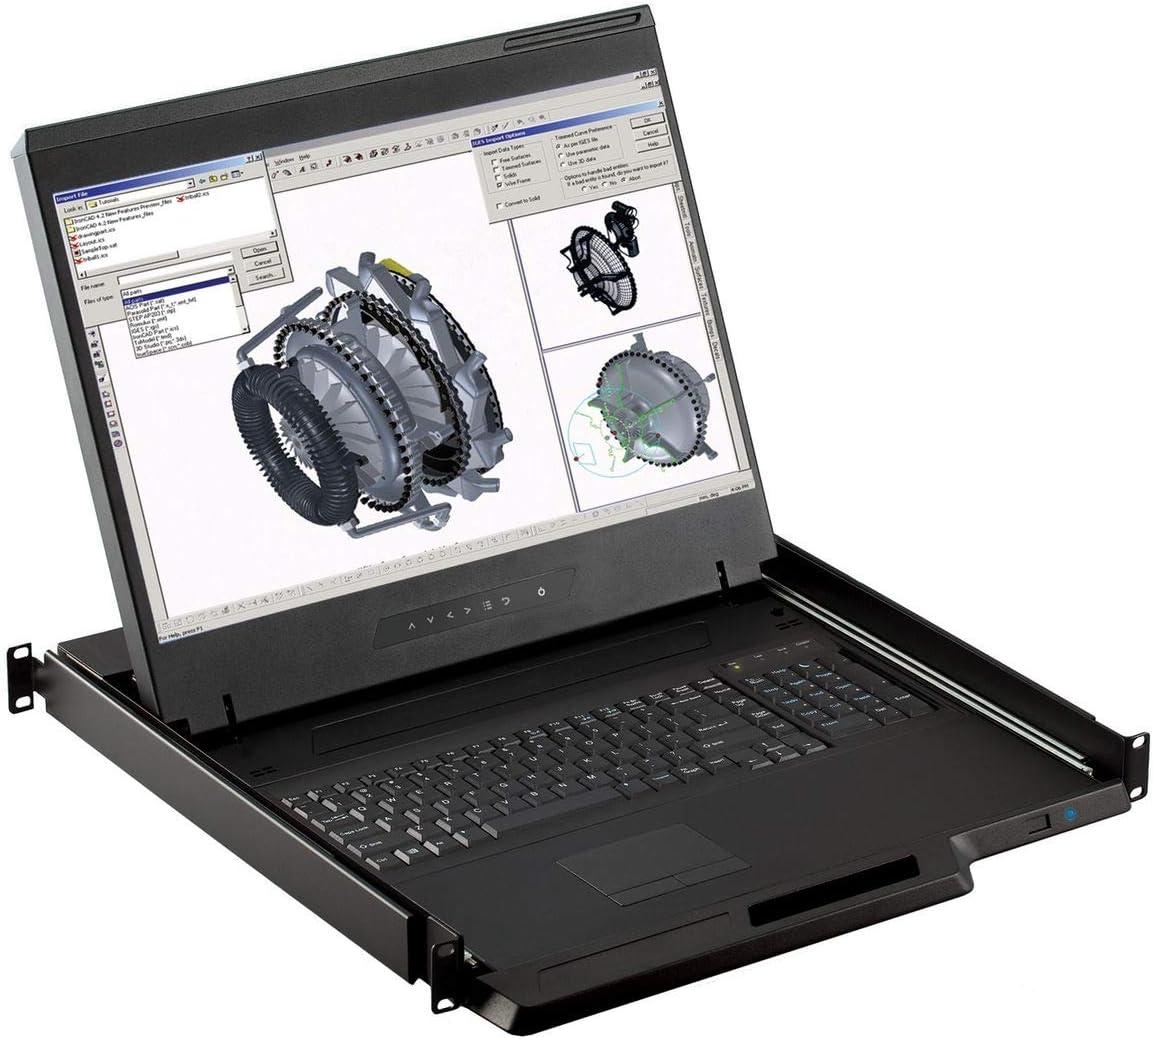 "Rackmount Console - 1U 19"" Rackmount Monitor, 1440 X 900 Resolution, VGA & DVI-D Input (Crystal Image Tech Part#RM-111-19WH) (VGA & DVI Input)"